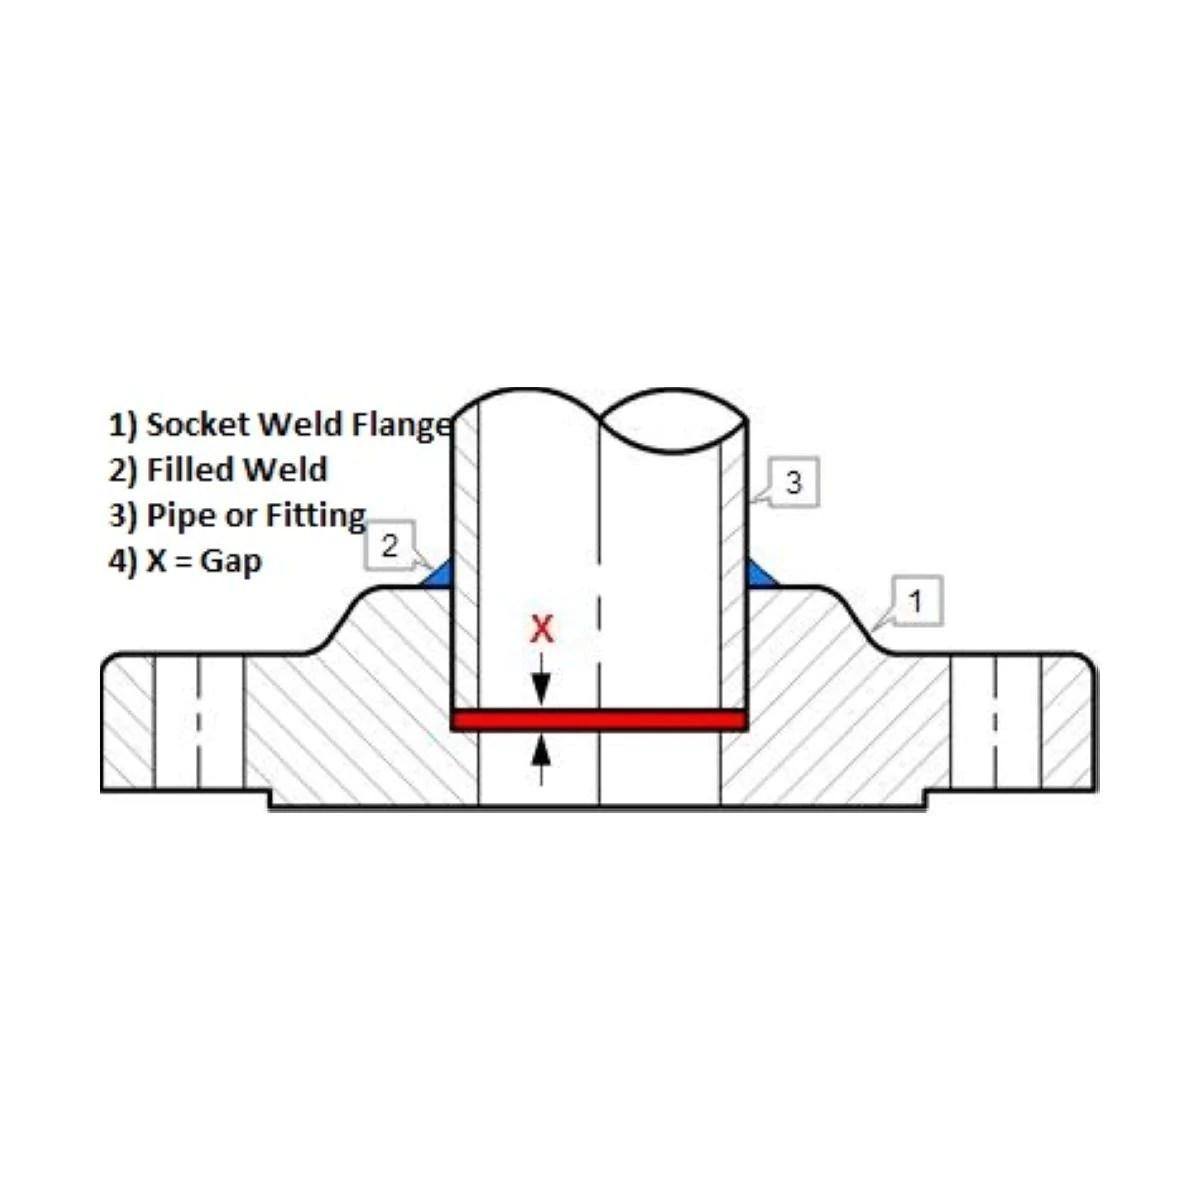 hight resolution of  socket weld flange ss304 diagram